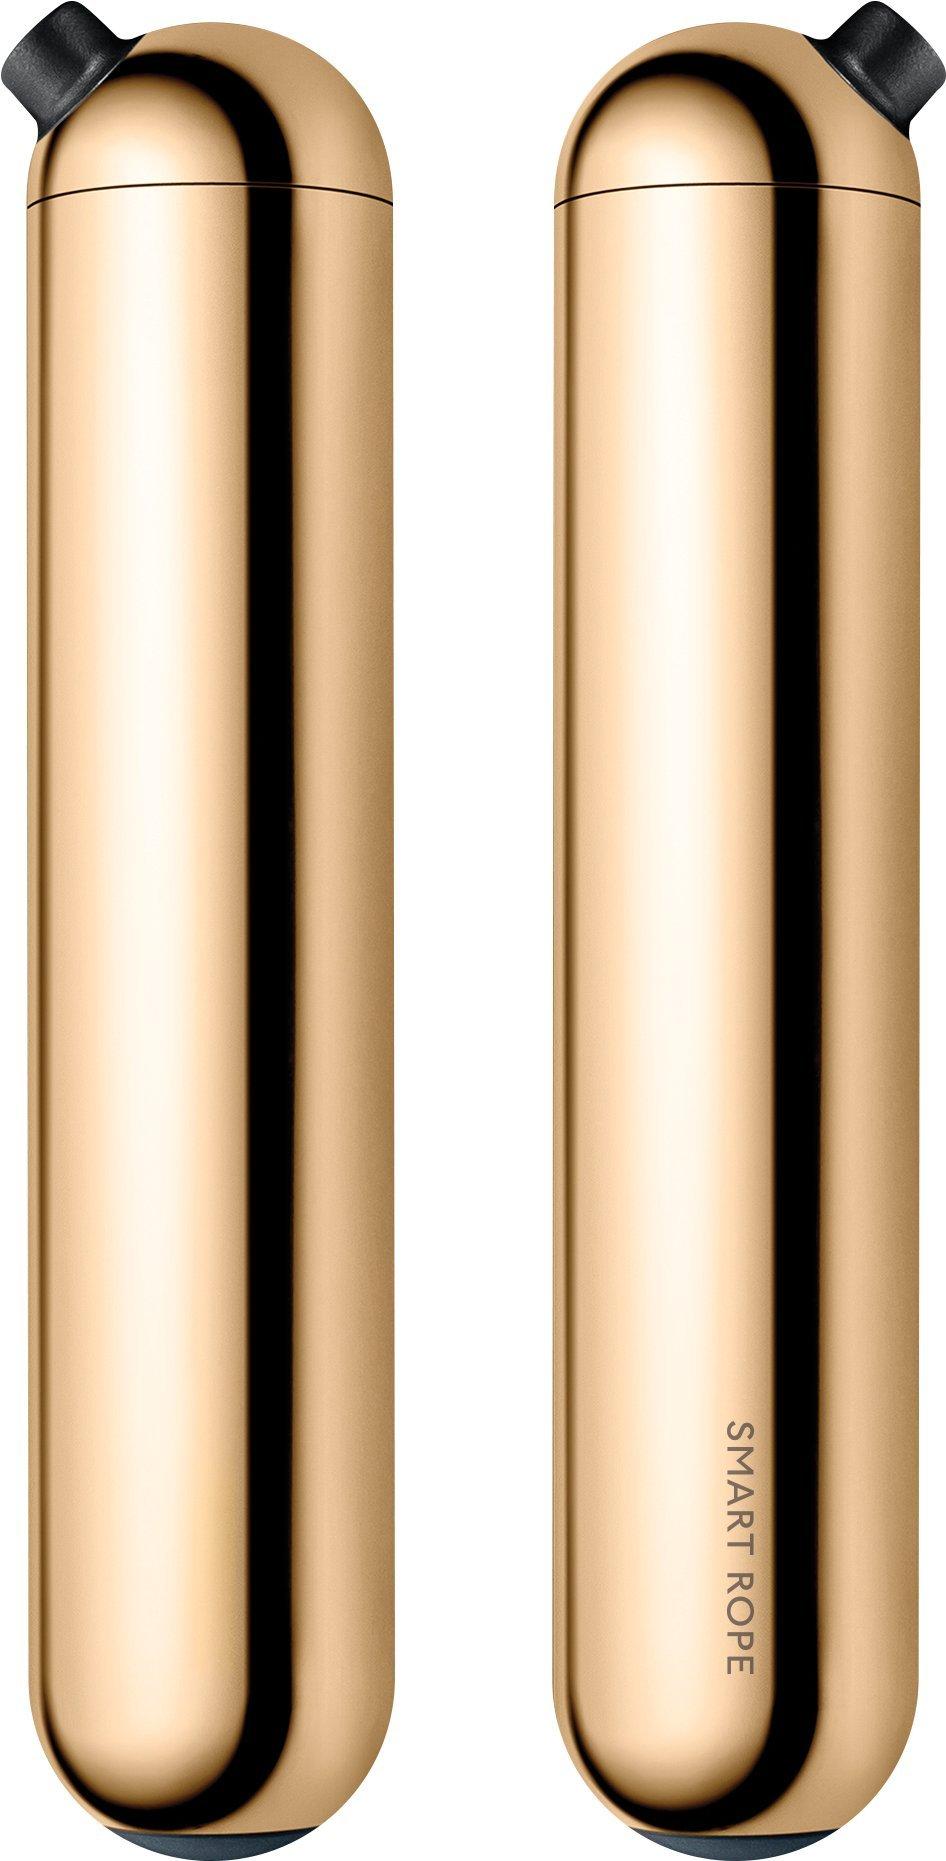 TANGRAM Factory Smart Rope - LED Embedded Jump Rope (Gold, Medium) by TANGRAM (Image #1)